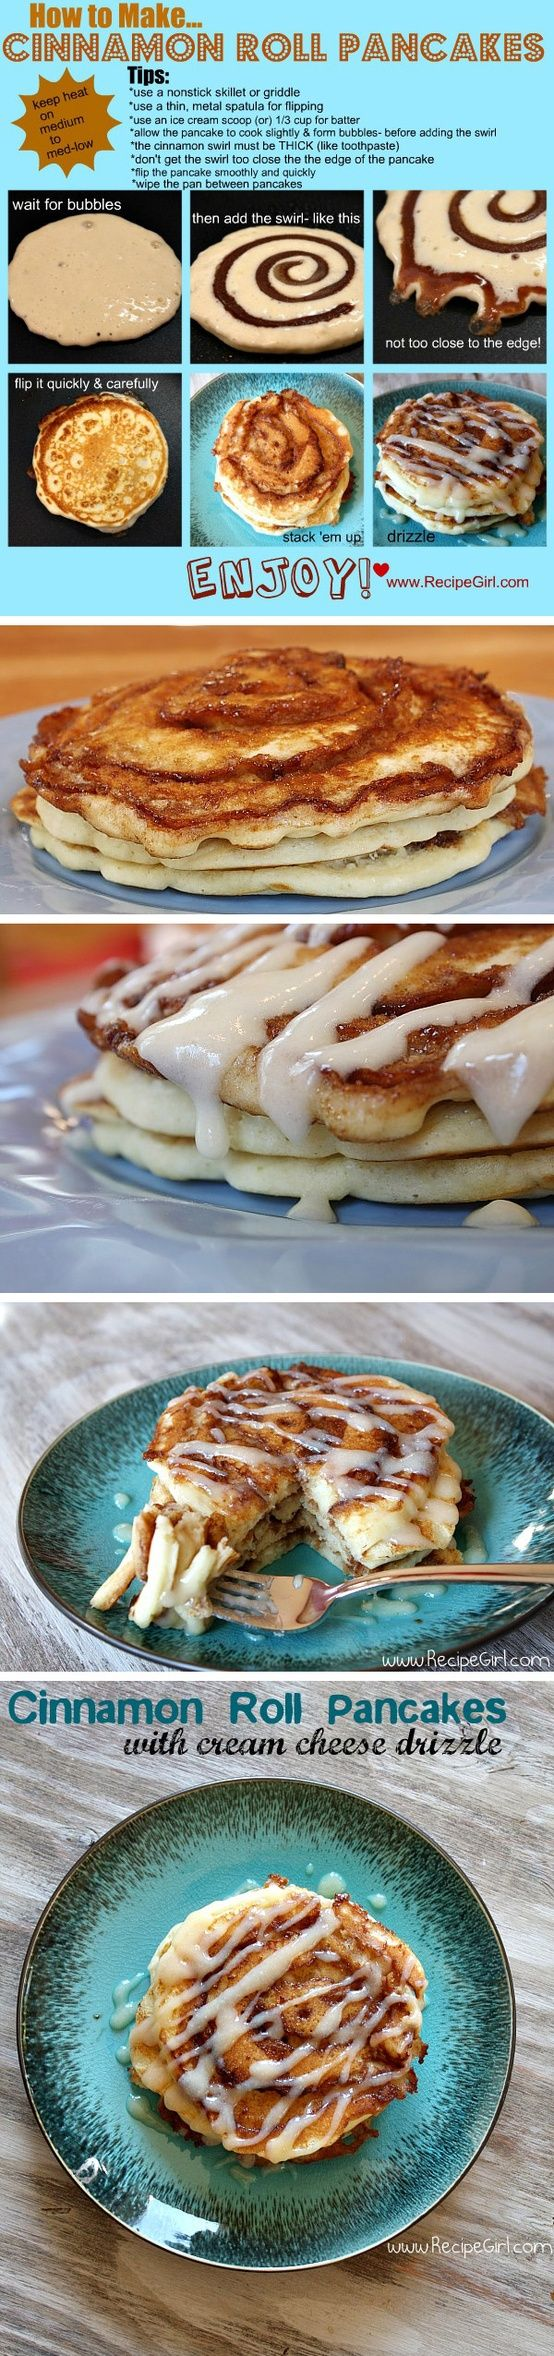 Cinnamon Roll Pancake DIY